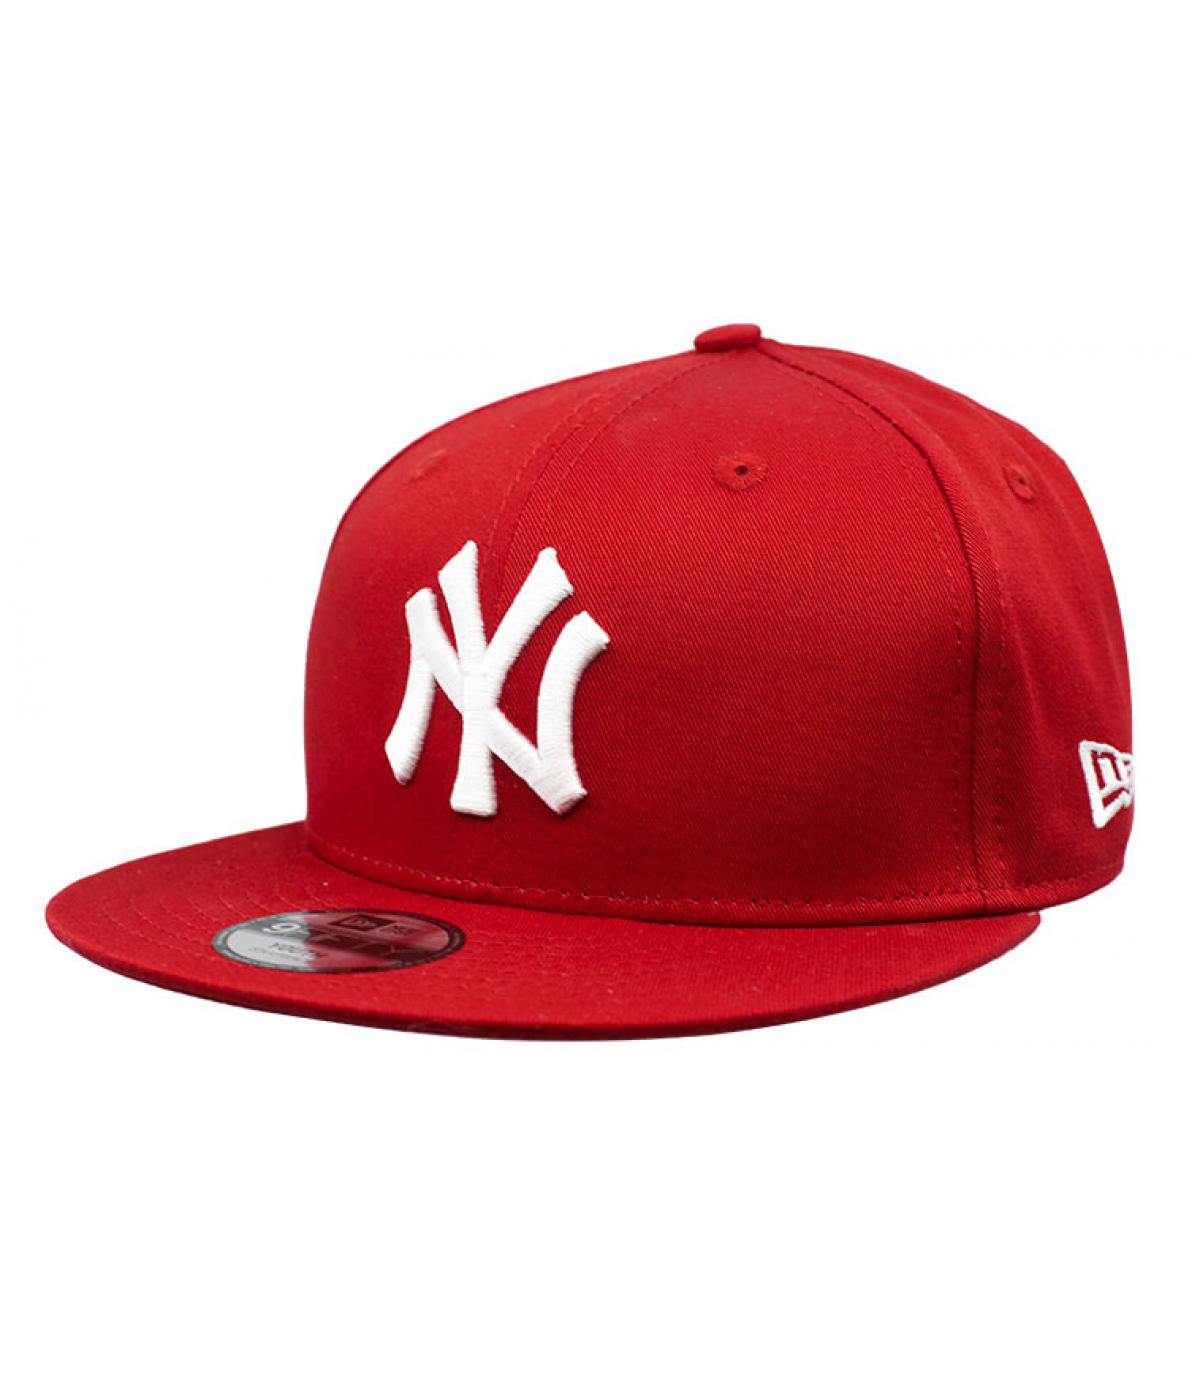 5c8c8fb0 Snapback rosso - Acquisto / Vendita Snapback rossi - Shop online Headict.